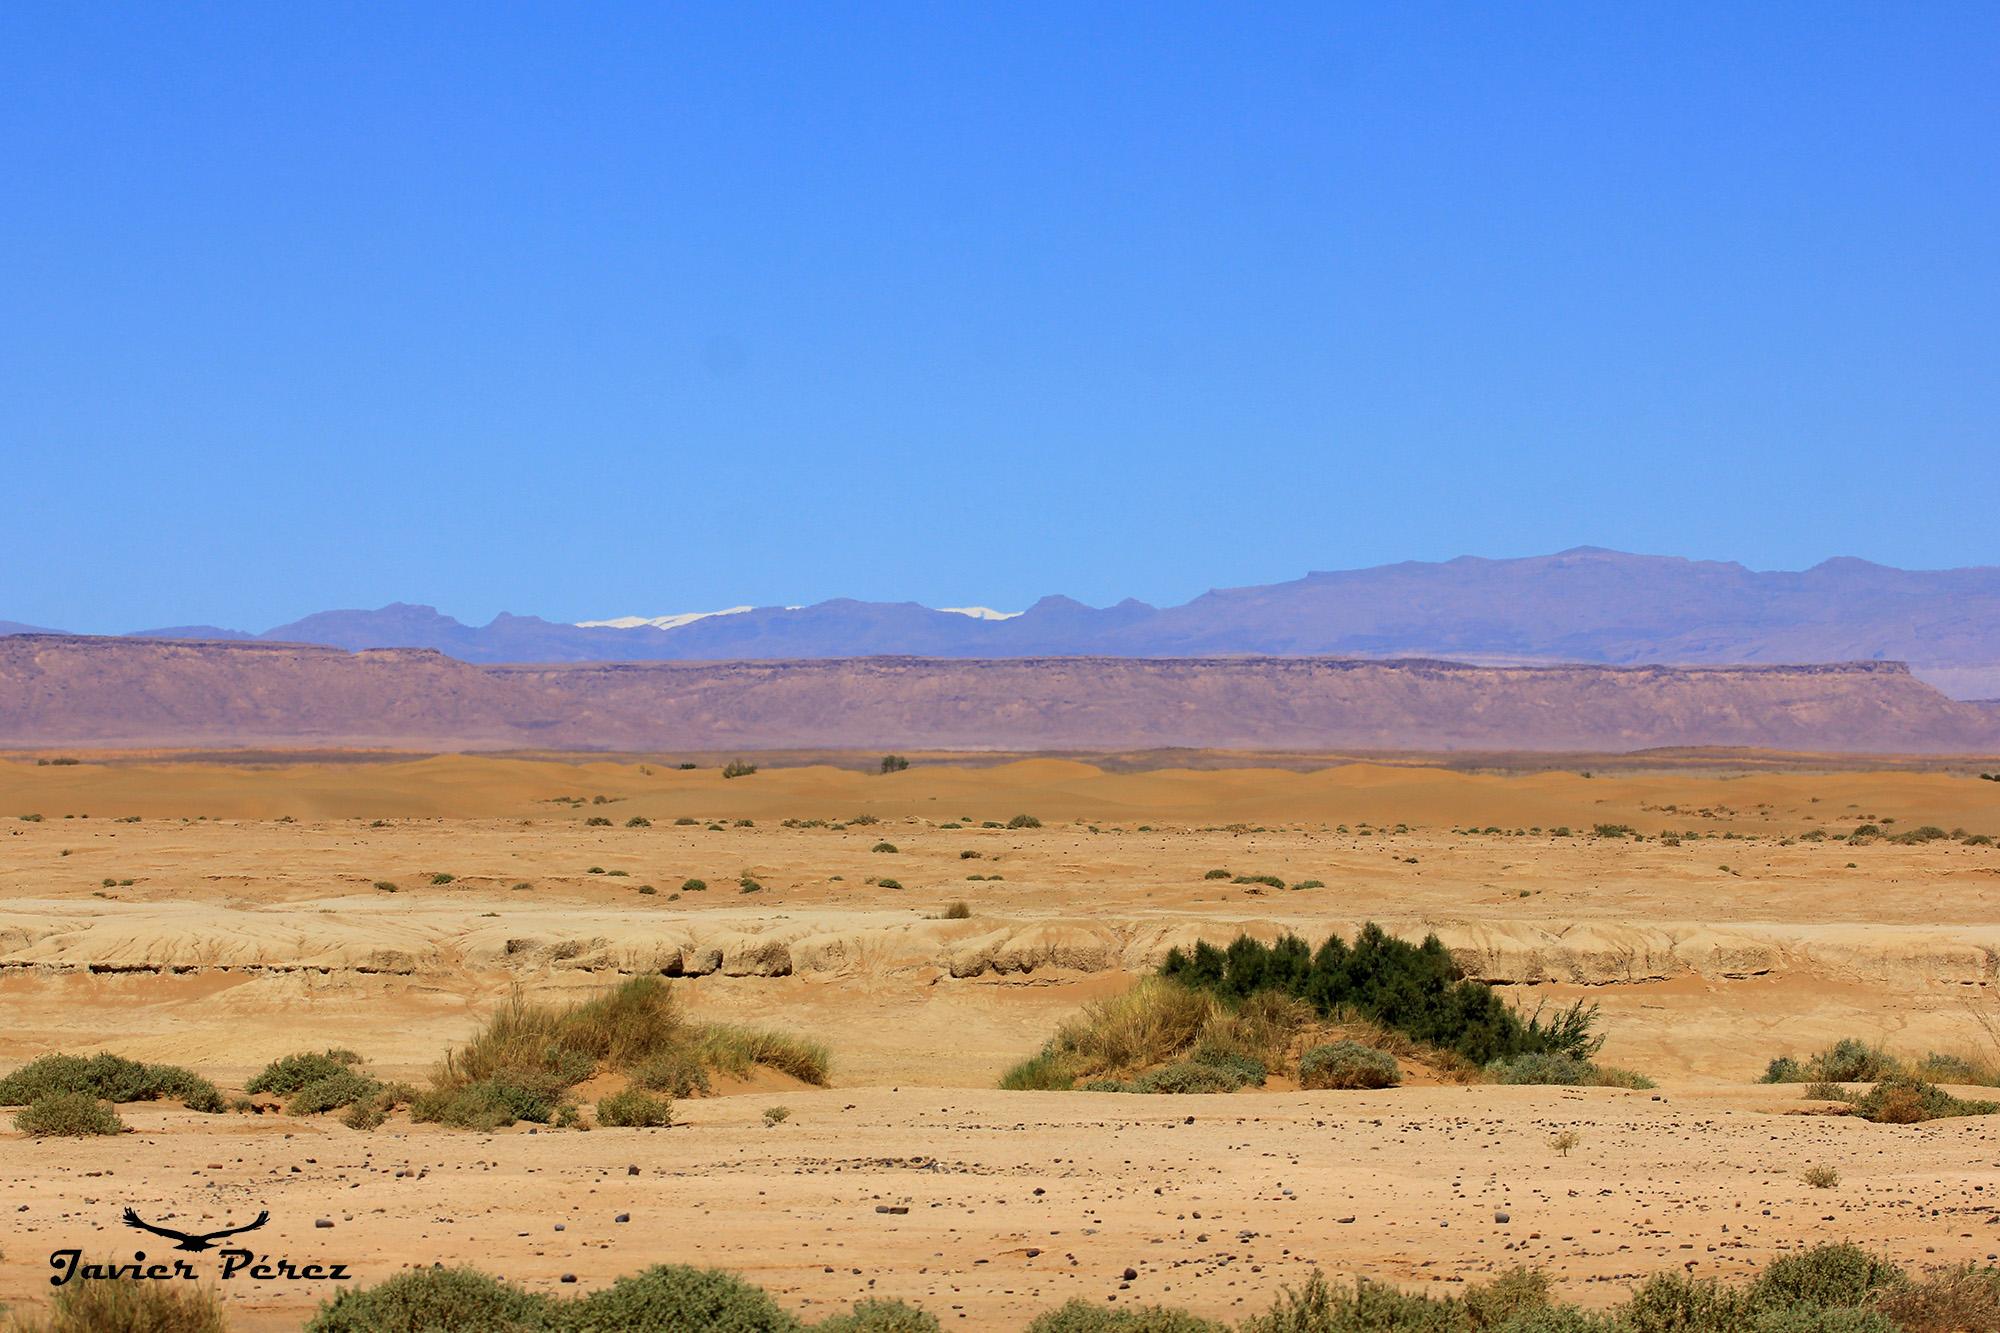 Desierto y Atlas al fondo